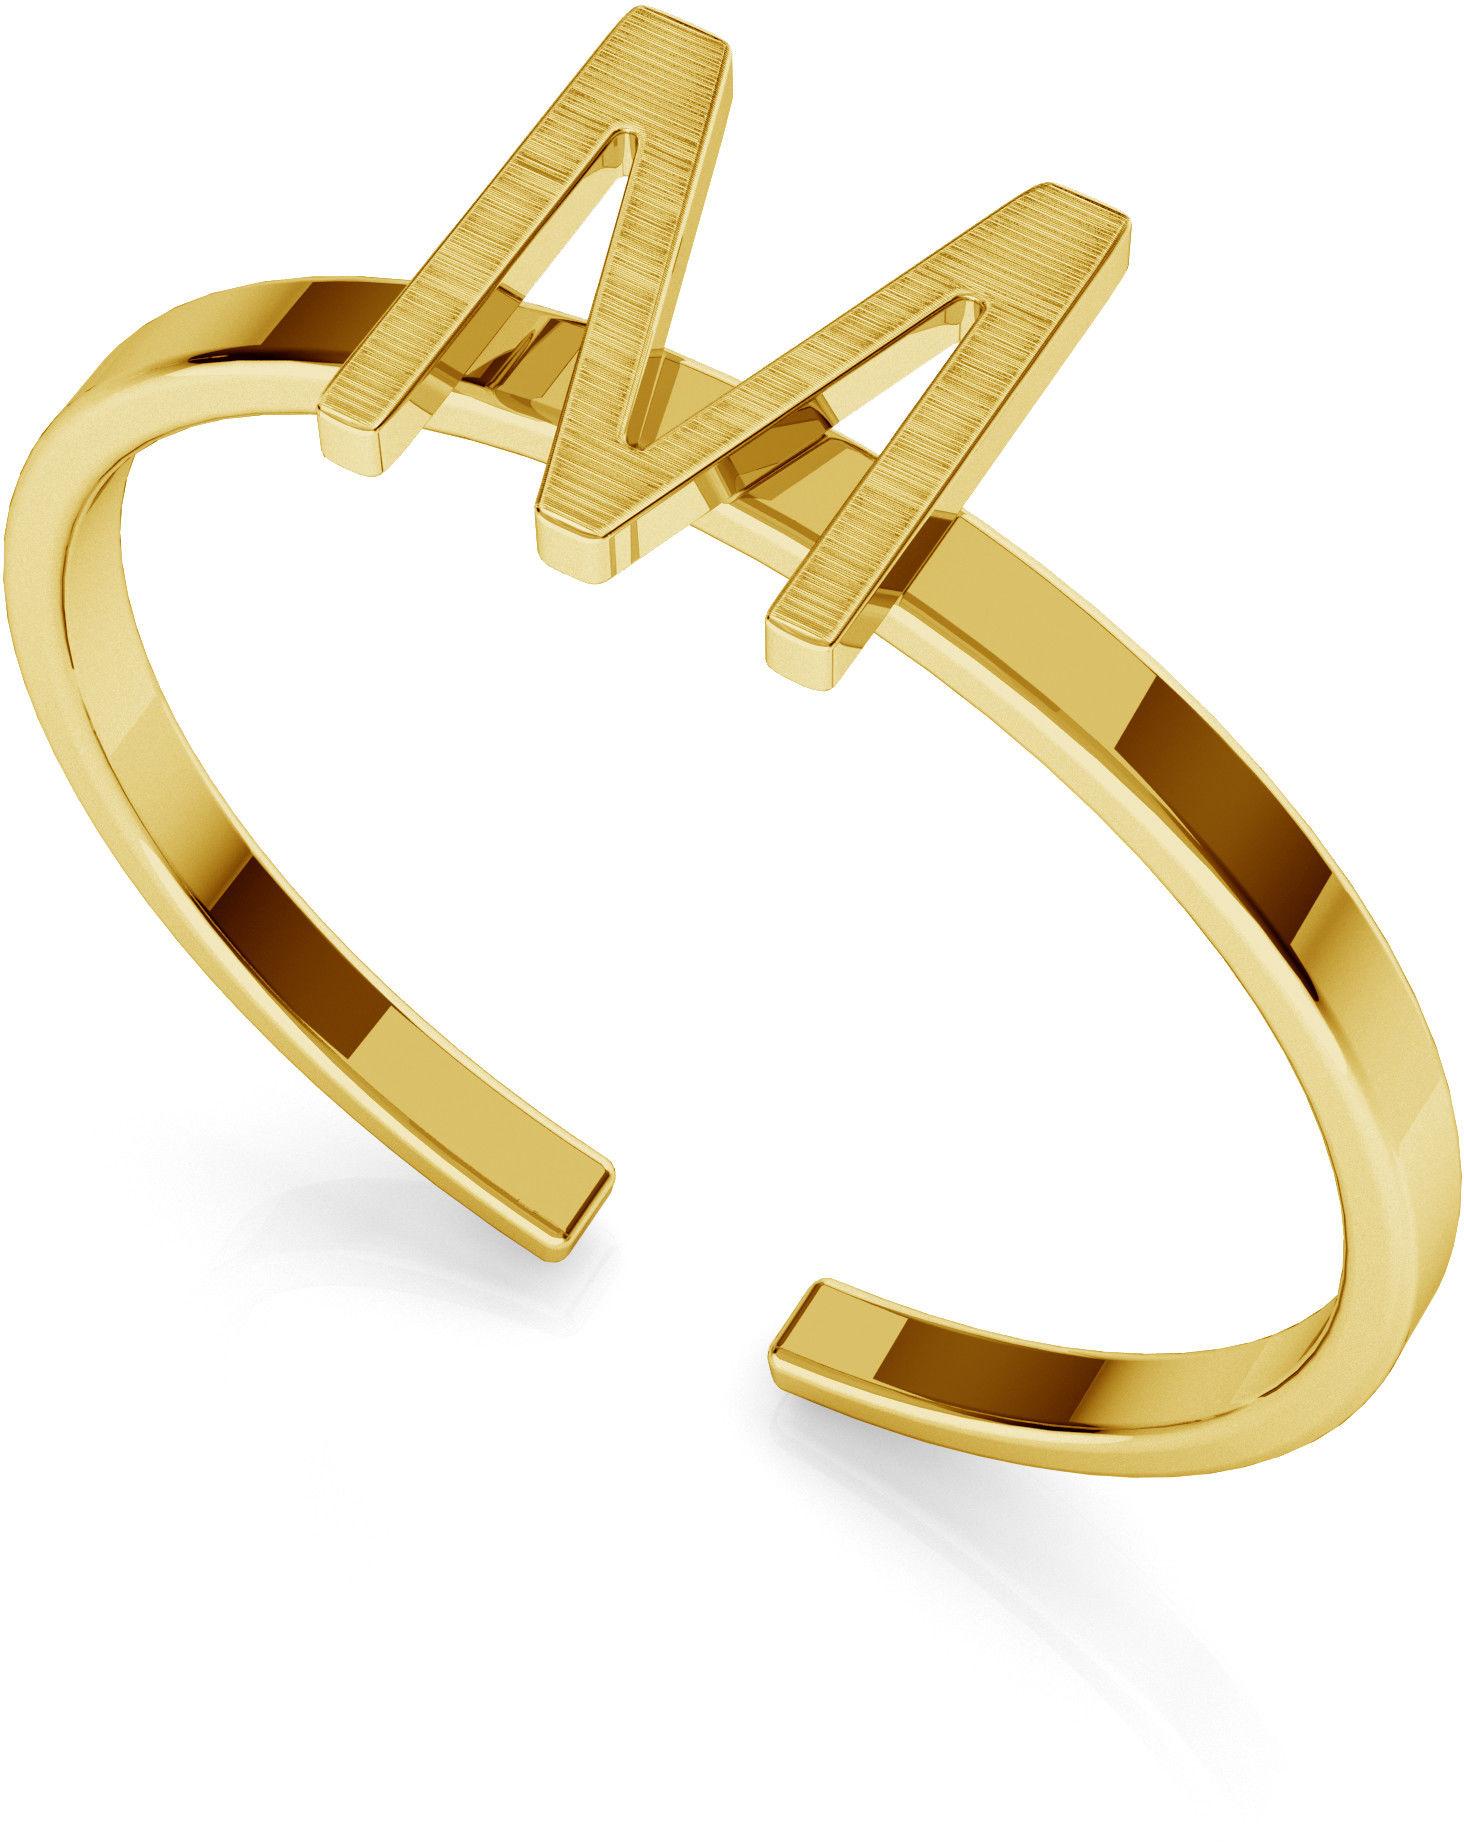 Srebrny pierścionek z literką My RING, srebro 925 : Litera - N, Srebro - kolor pokrycia - Pokrycie platyną